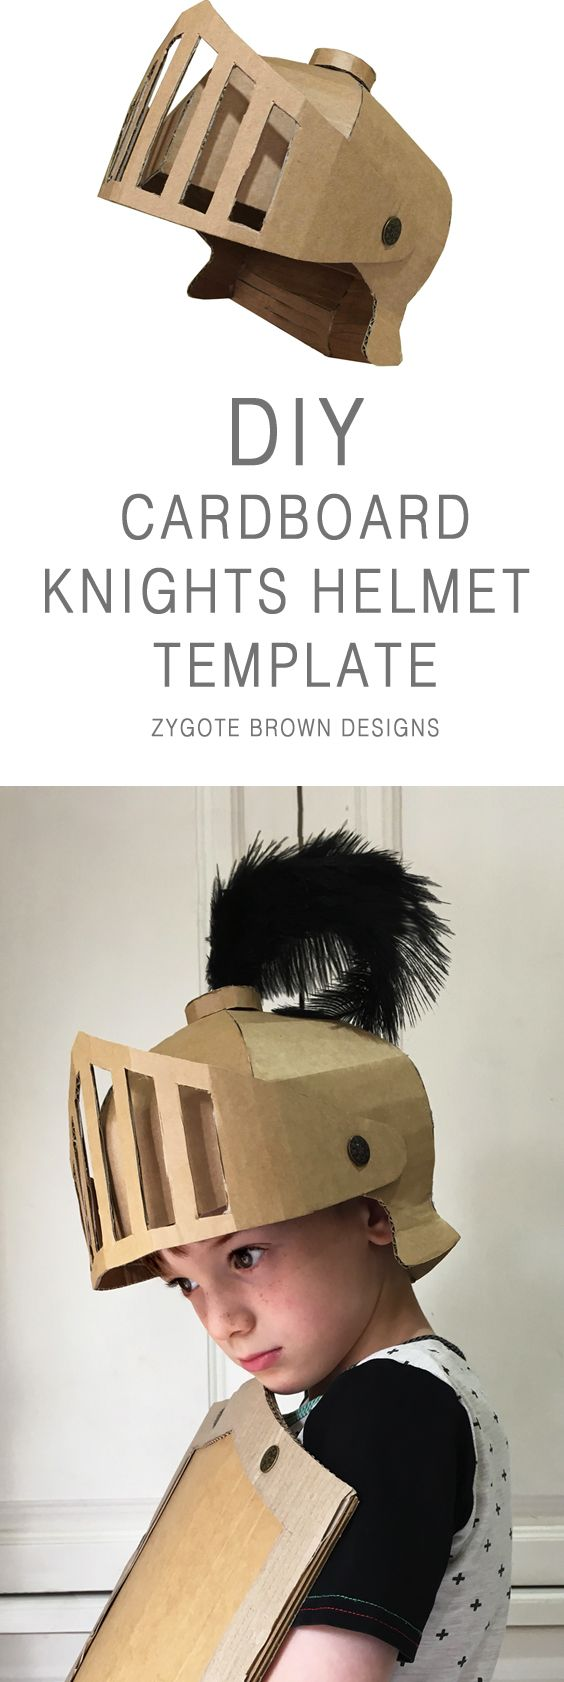 Cardboard Helmet for DIY Knight Costume.